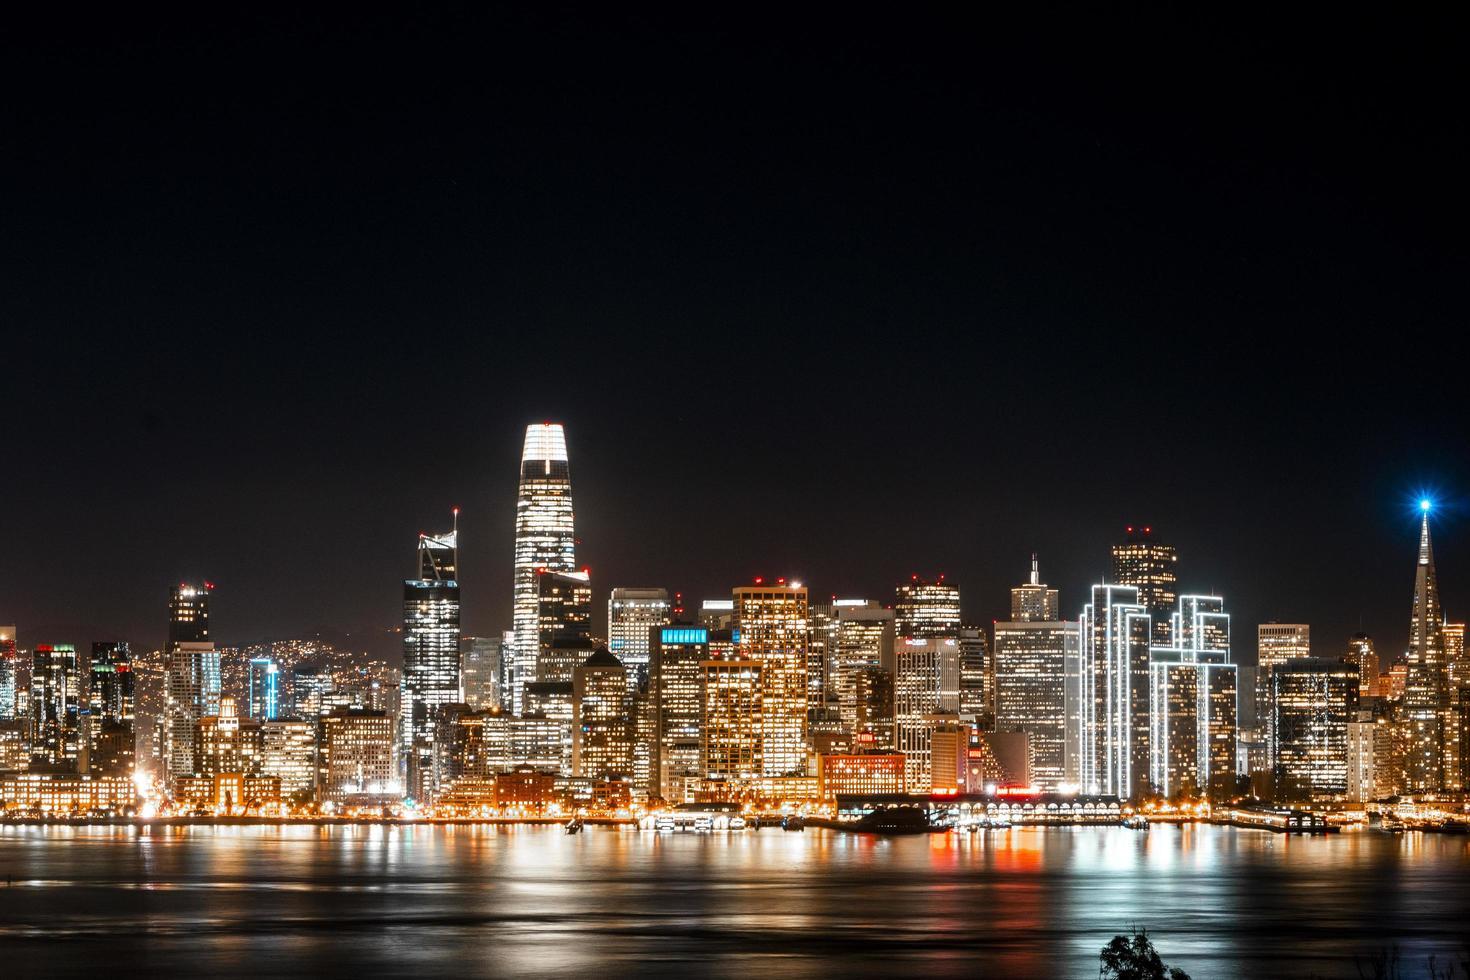 City skyline during night time photo